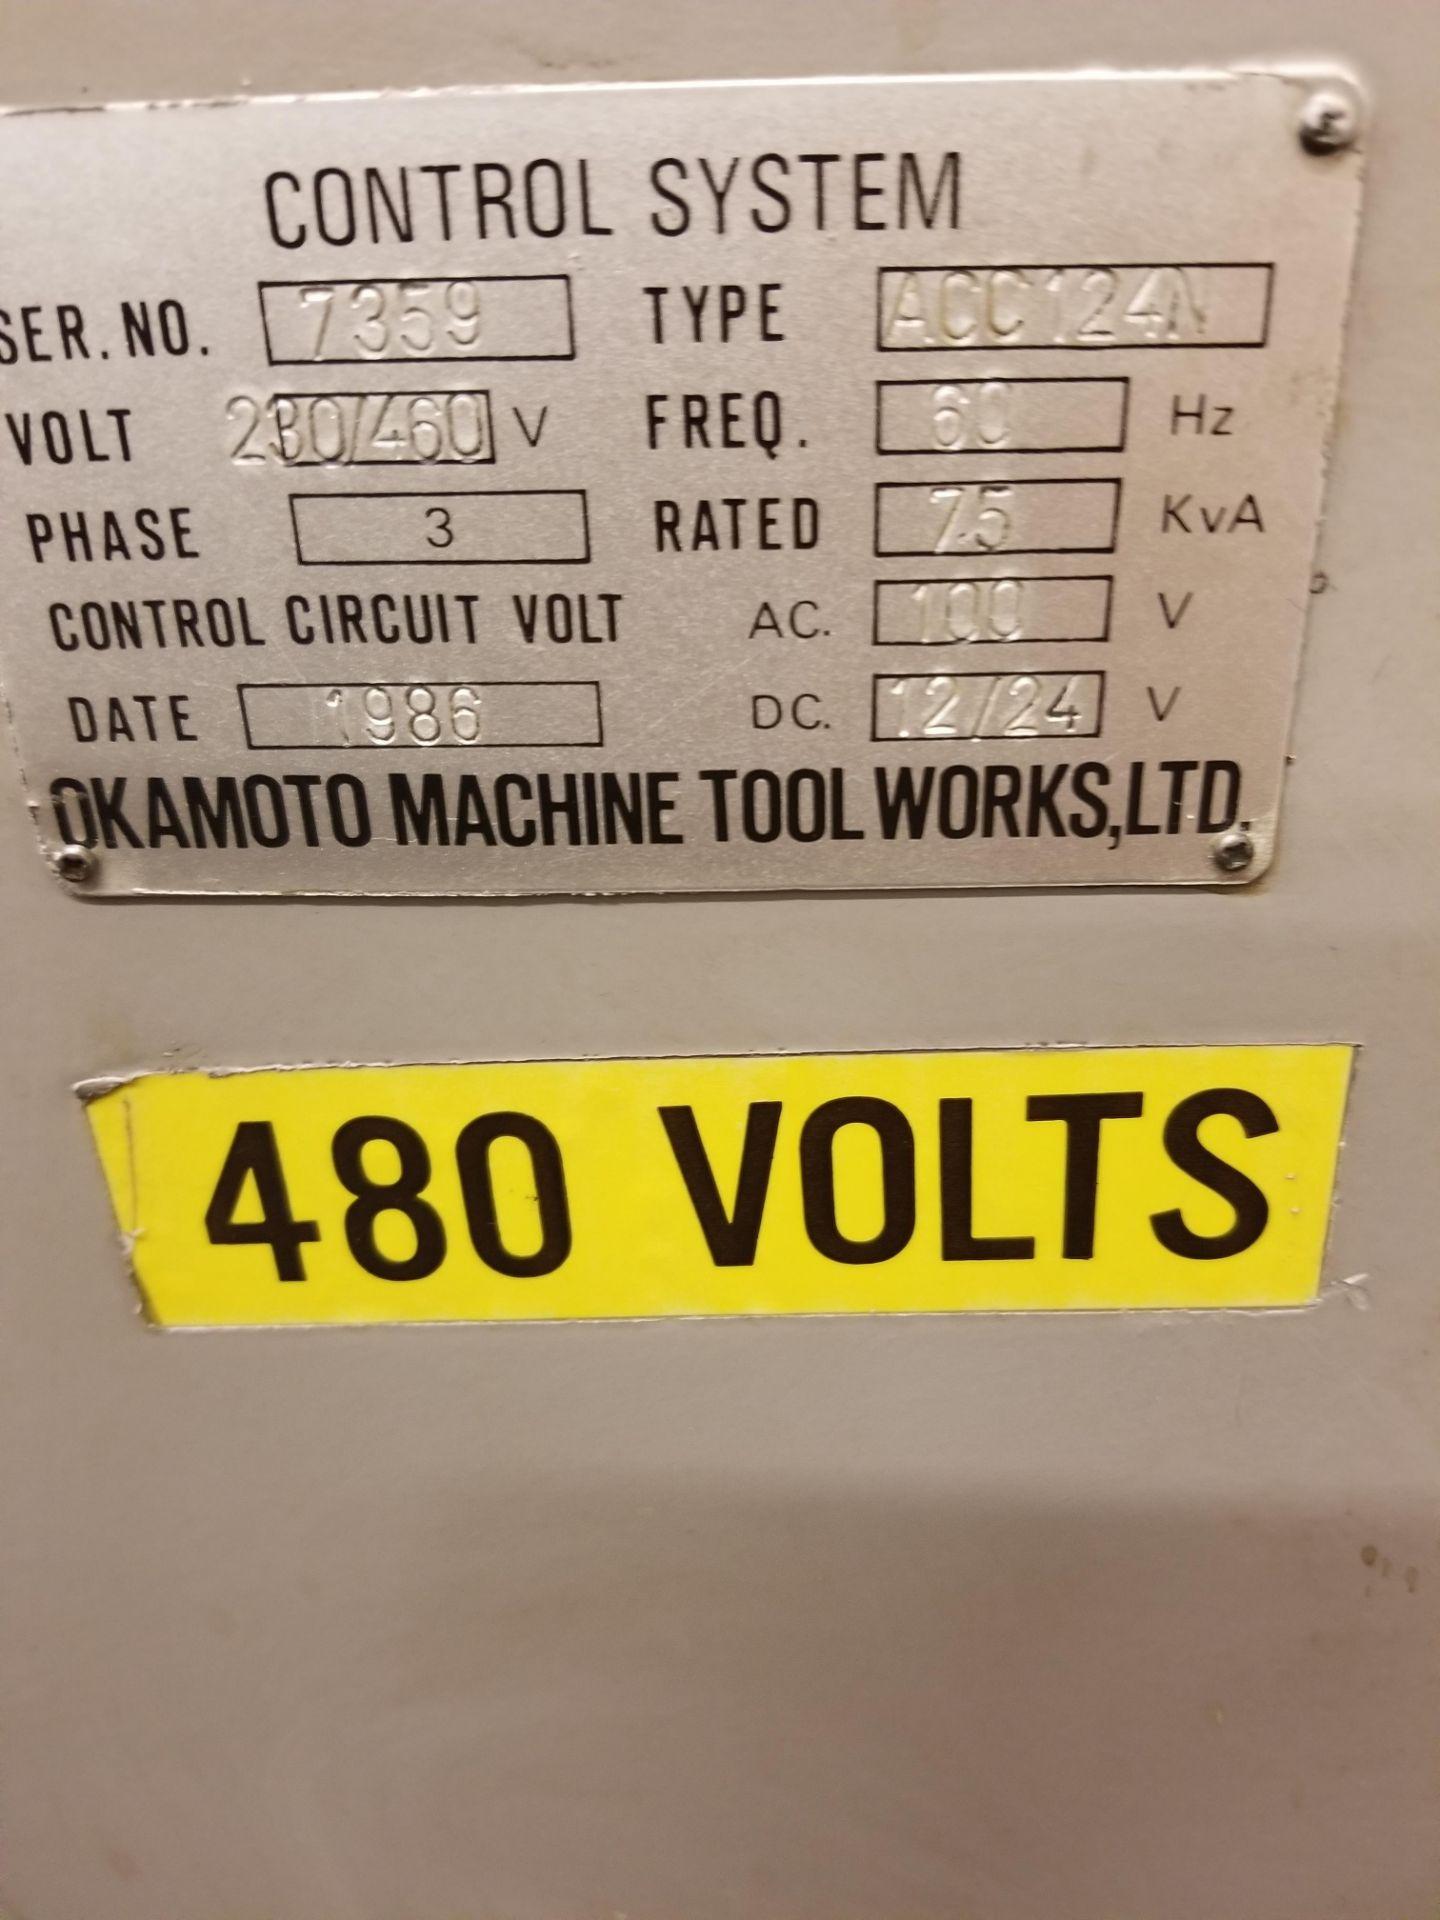 "Okamoto ACC-124N Hydraulic Surface Grinder 14"" Wheel w/ 12"" x 24"" Walker Electromagnetic Chuck - Image 13 of 14"